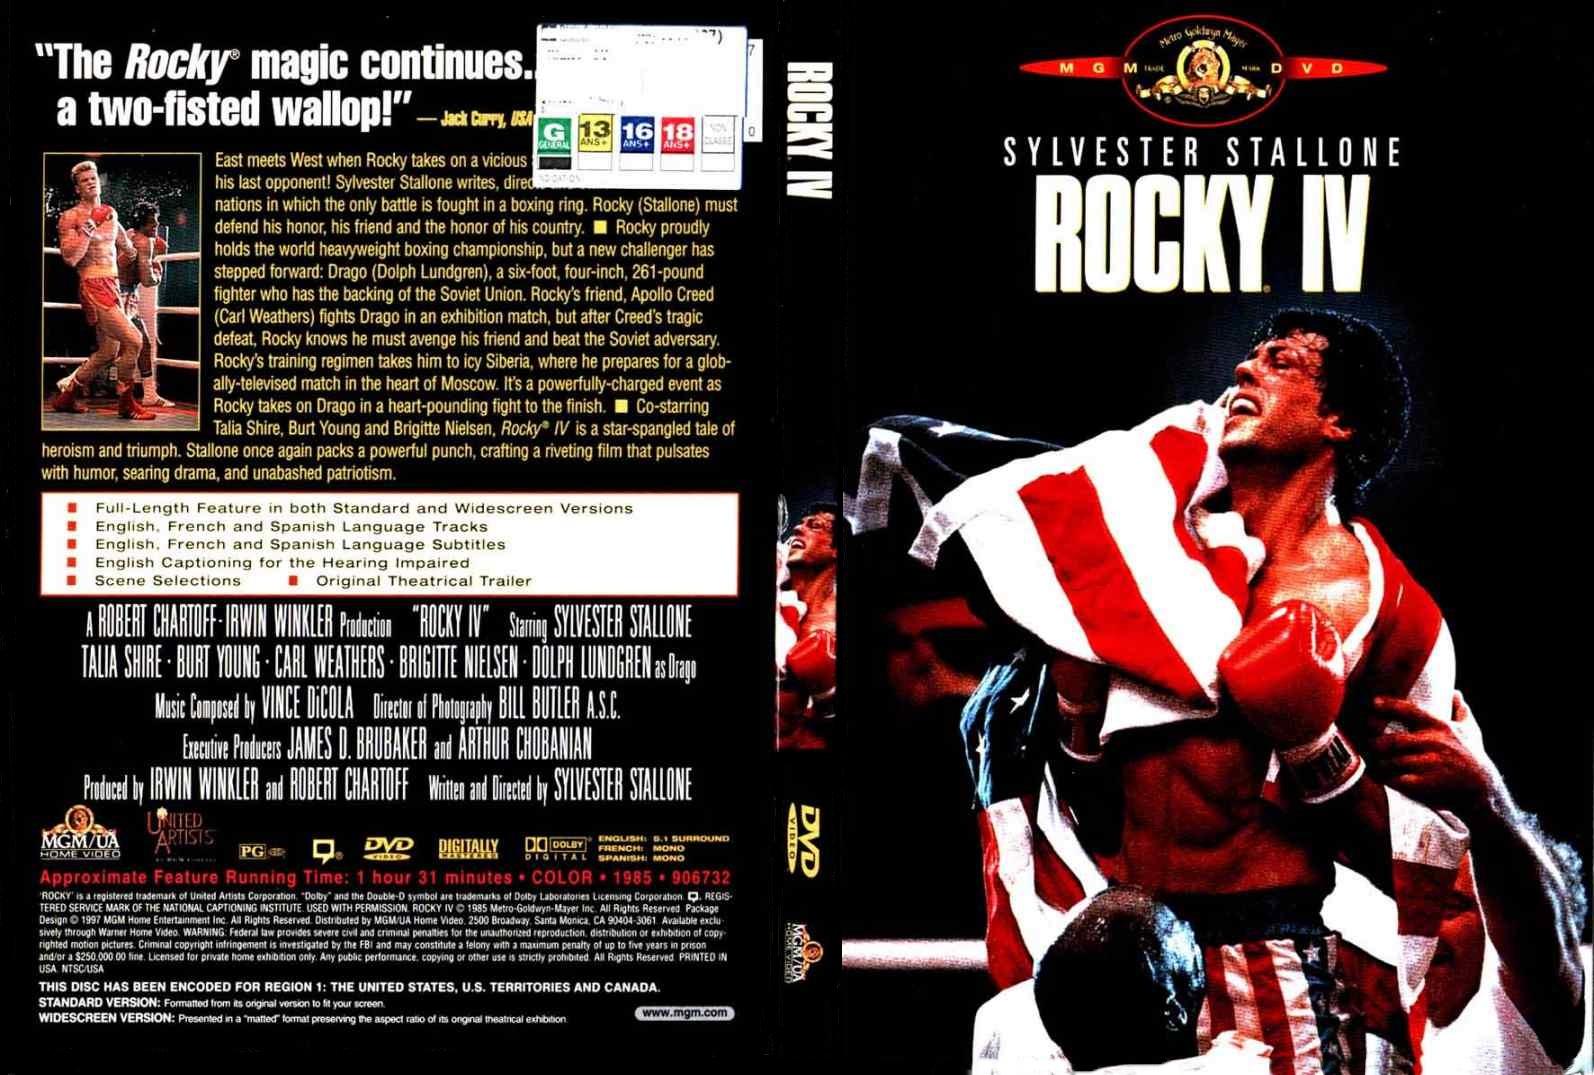 http://4.bp.blogspot.com/_pRGIjX2JPk8/TCM2Fxo76JI/AAAAAAAAARY/nGABAwL4R4k/s1600/Rocky_4_dvd-front.jpg